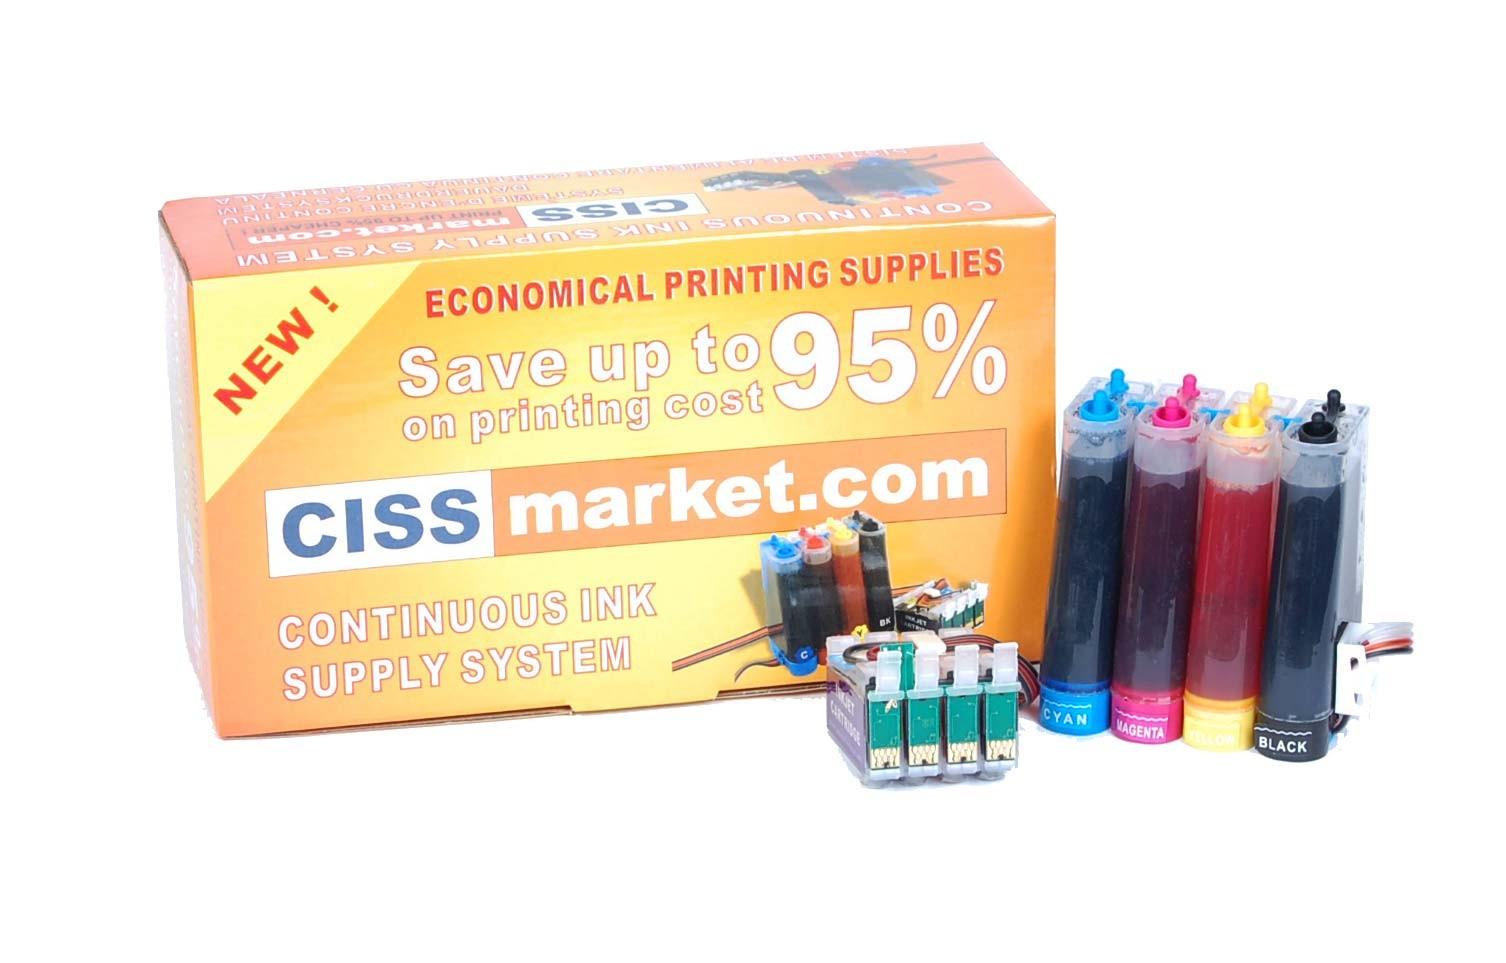 epson wf 2530 service manual